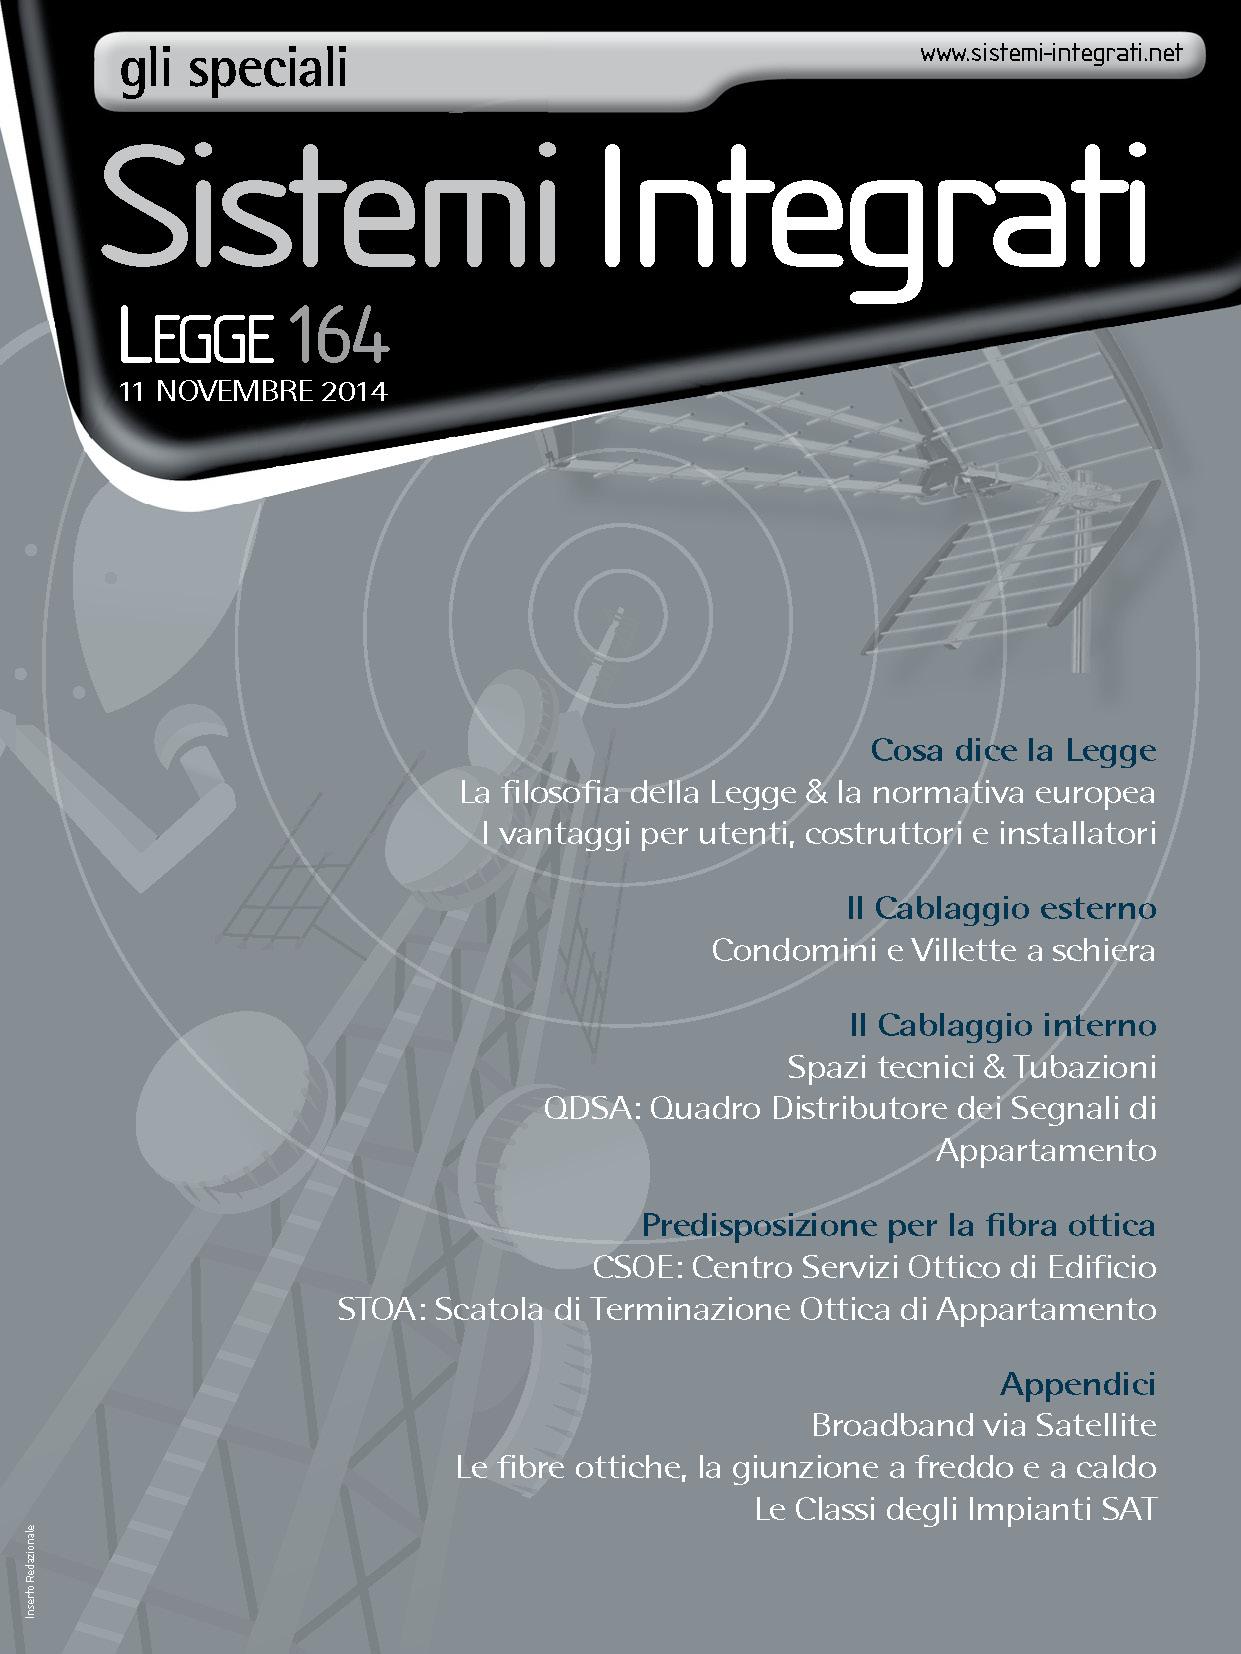 Sistemi Integrati - Tv Digitale Volume 1 - 2015 Speciale Legge 164